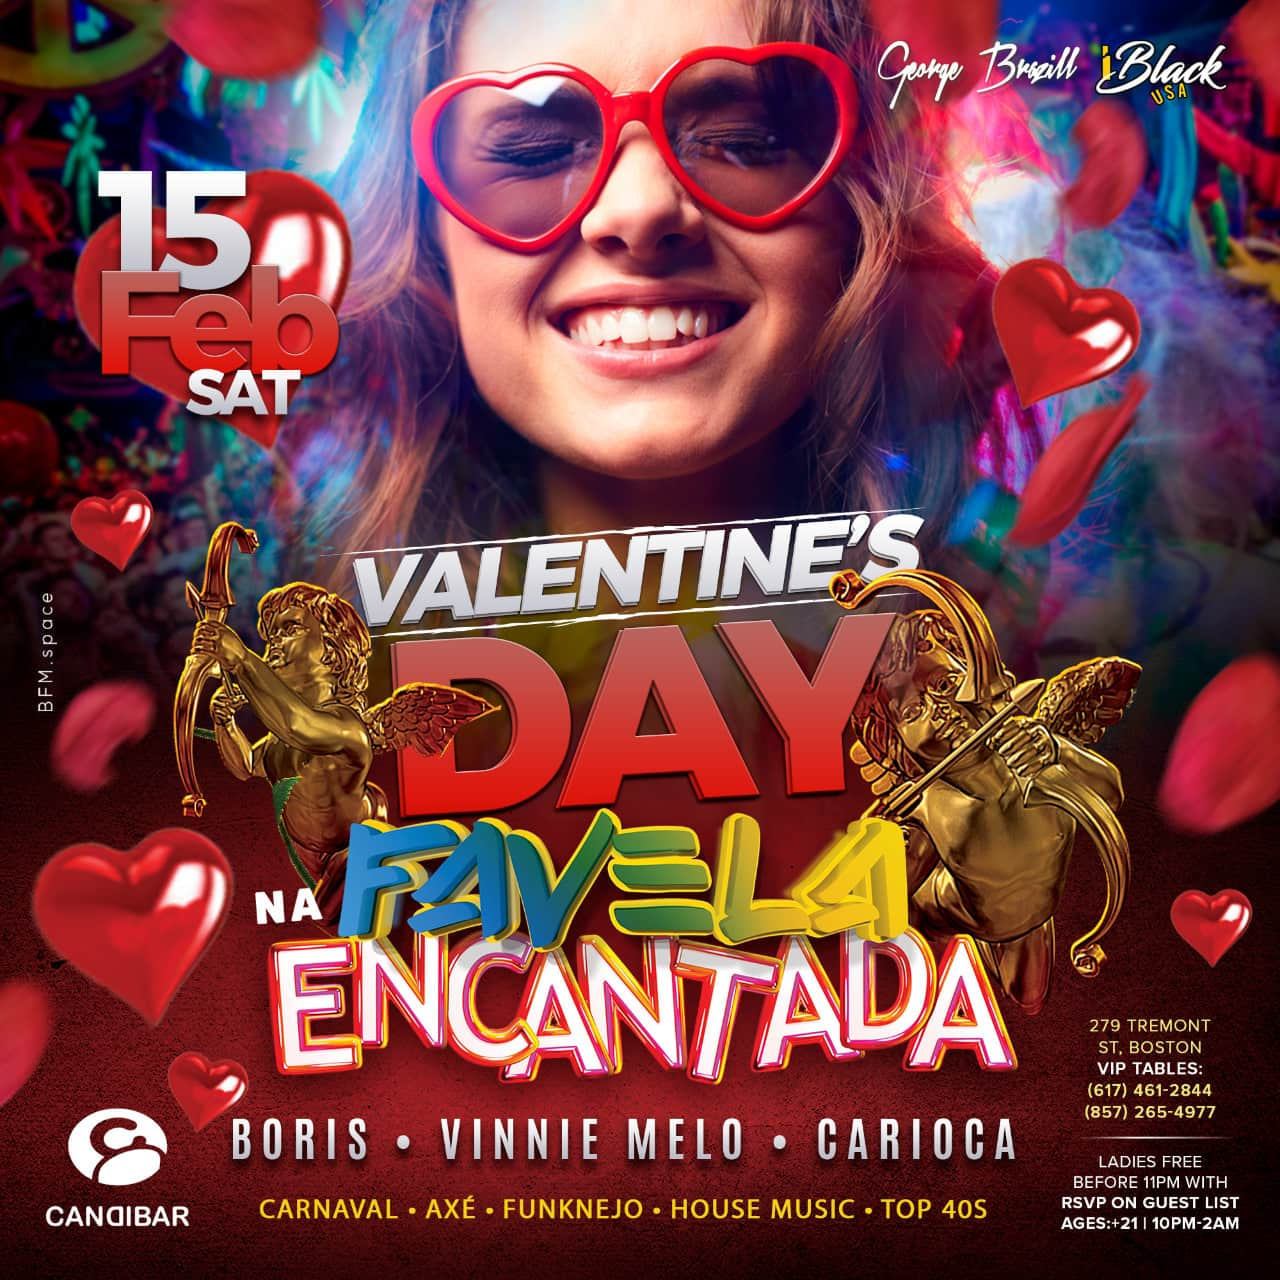 FAVELA ENCANTADA VALENTINE'S DAY 15 FEB - CANDIBAR BOSTON | iBlackUSA